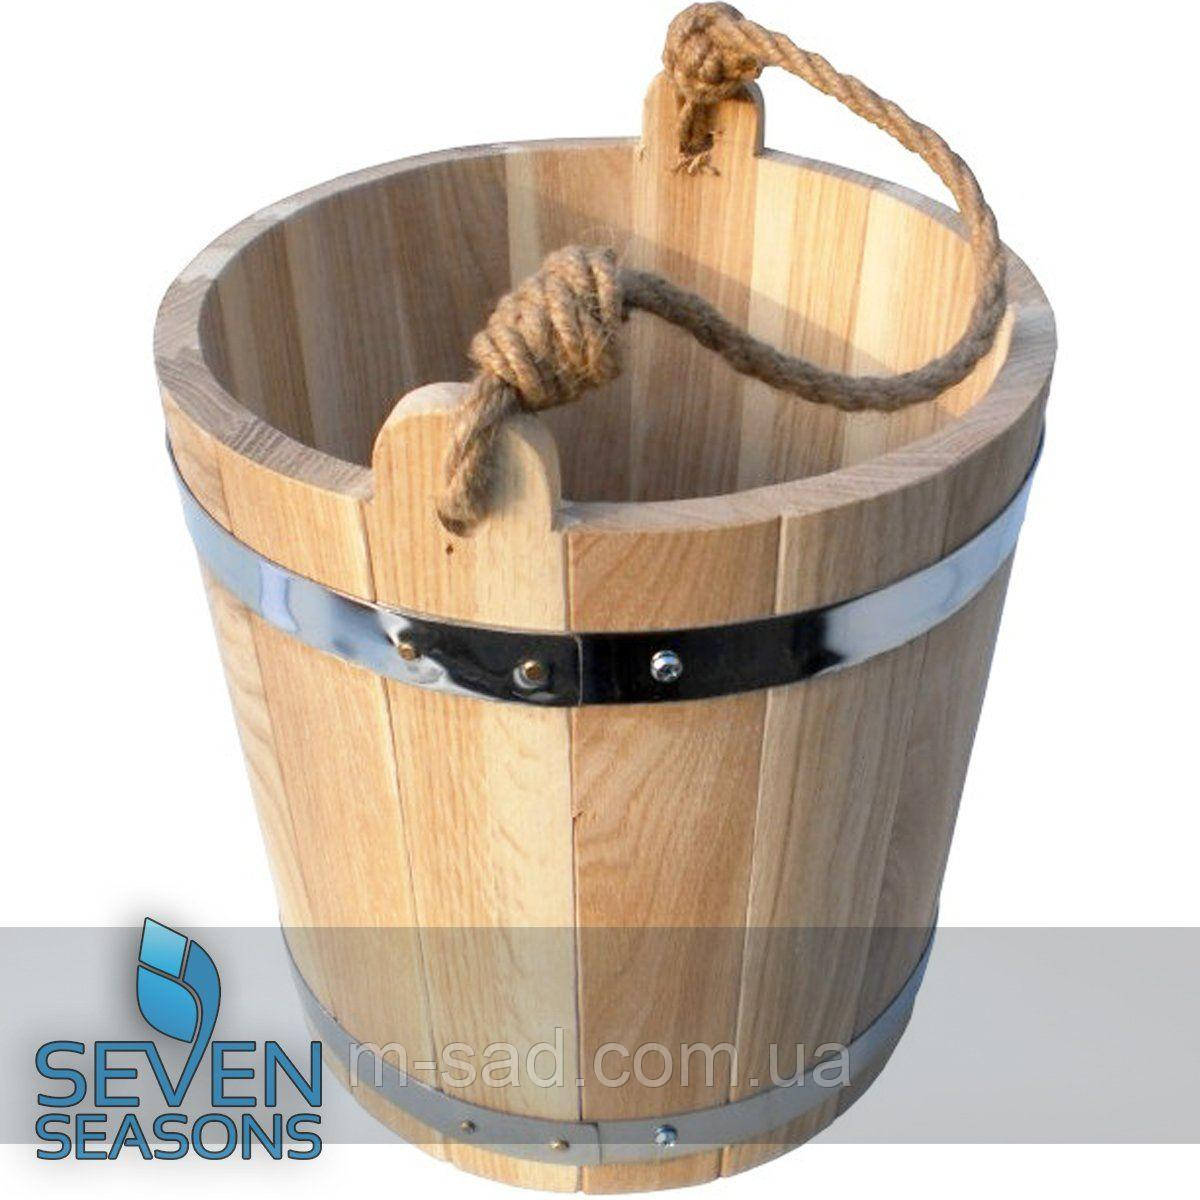 Дубовое ведро для бани Seven Seasons™, 15 литров